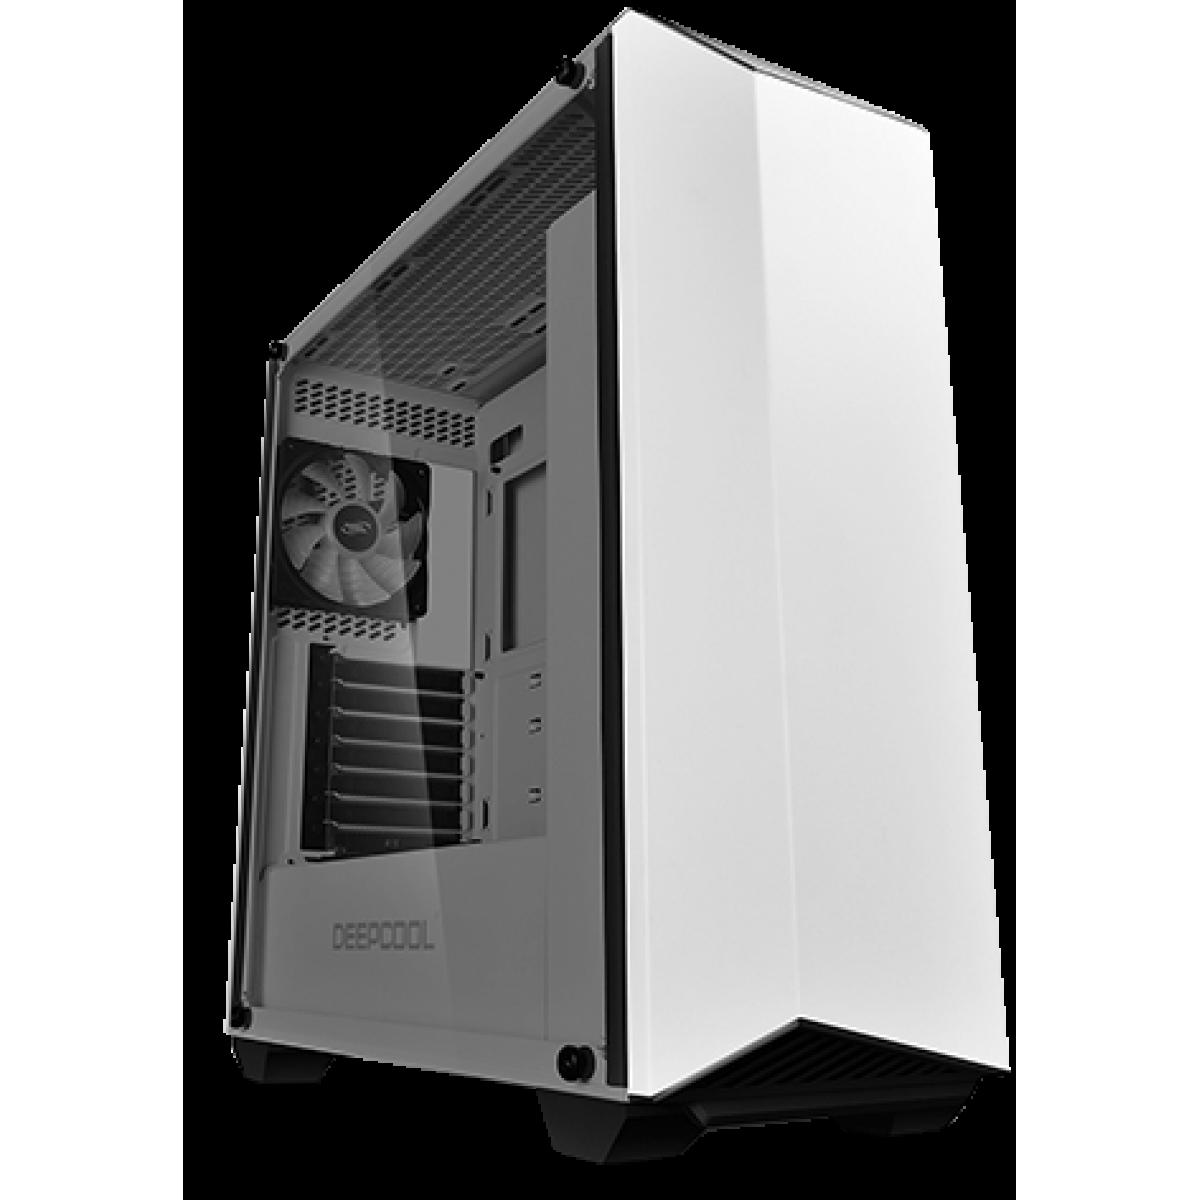 Gabinete Gamer DeepCool Earlkase RGB WH, Mid Tower, Com 2 Fans, Vidro Temperado, White, Sem Fonte, EARLKASERGBWH